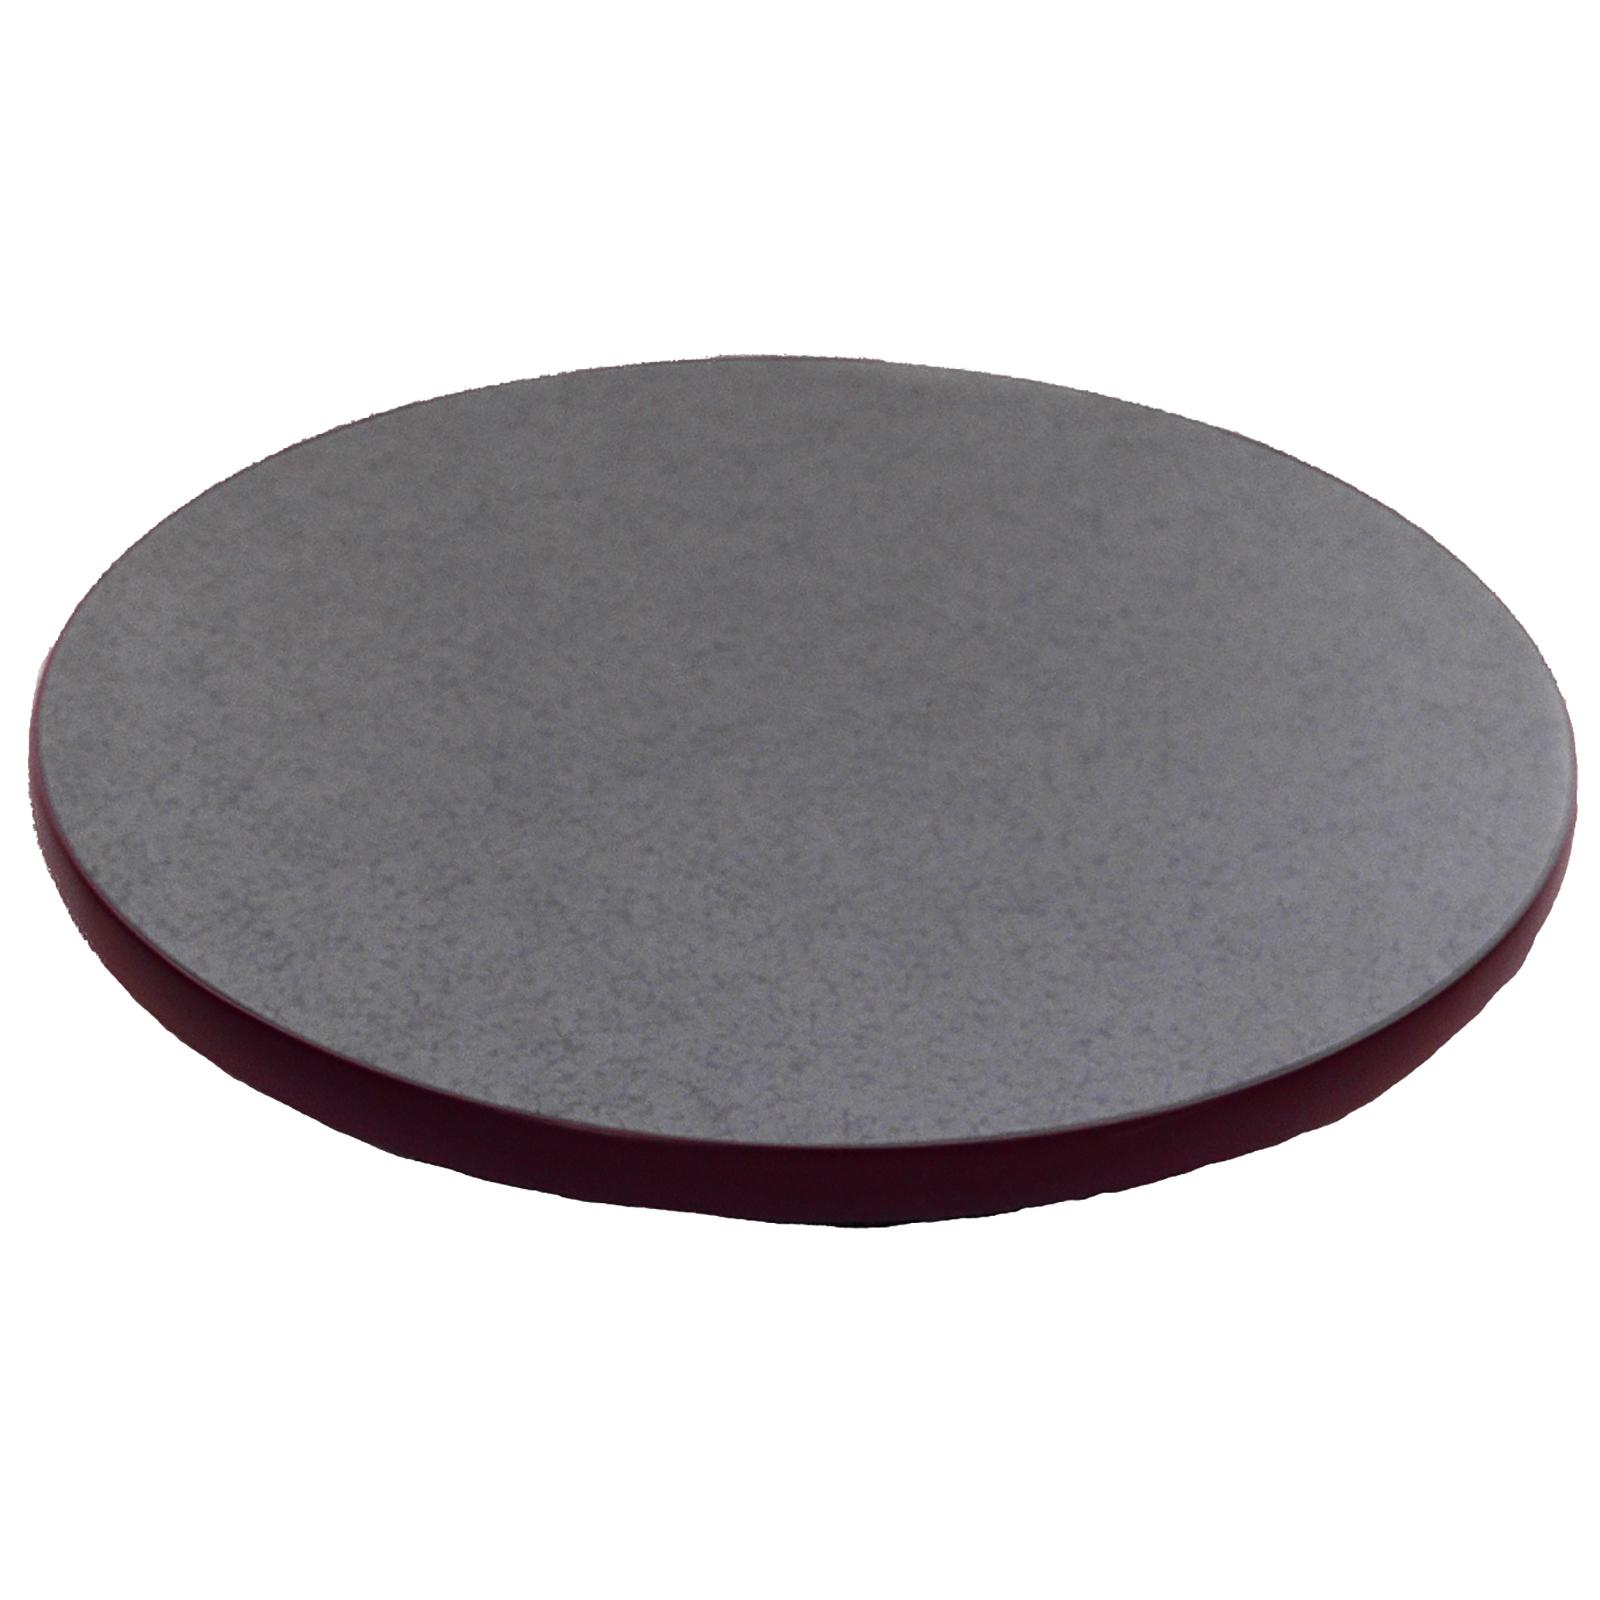 Oak Street CTM3060-1 table top, laminate